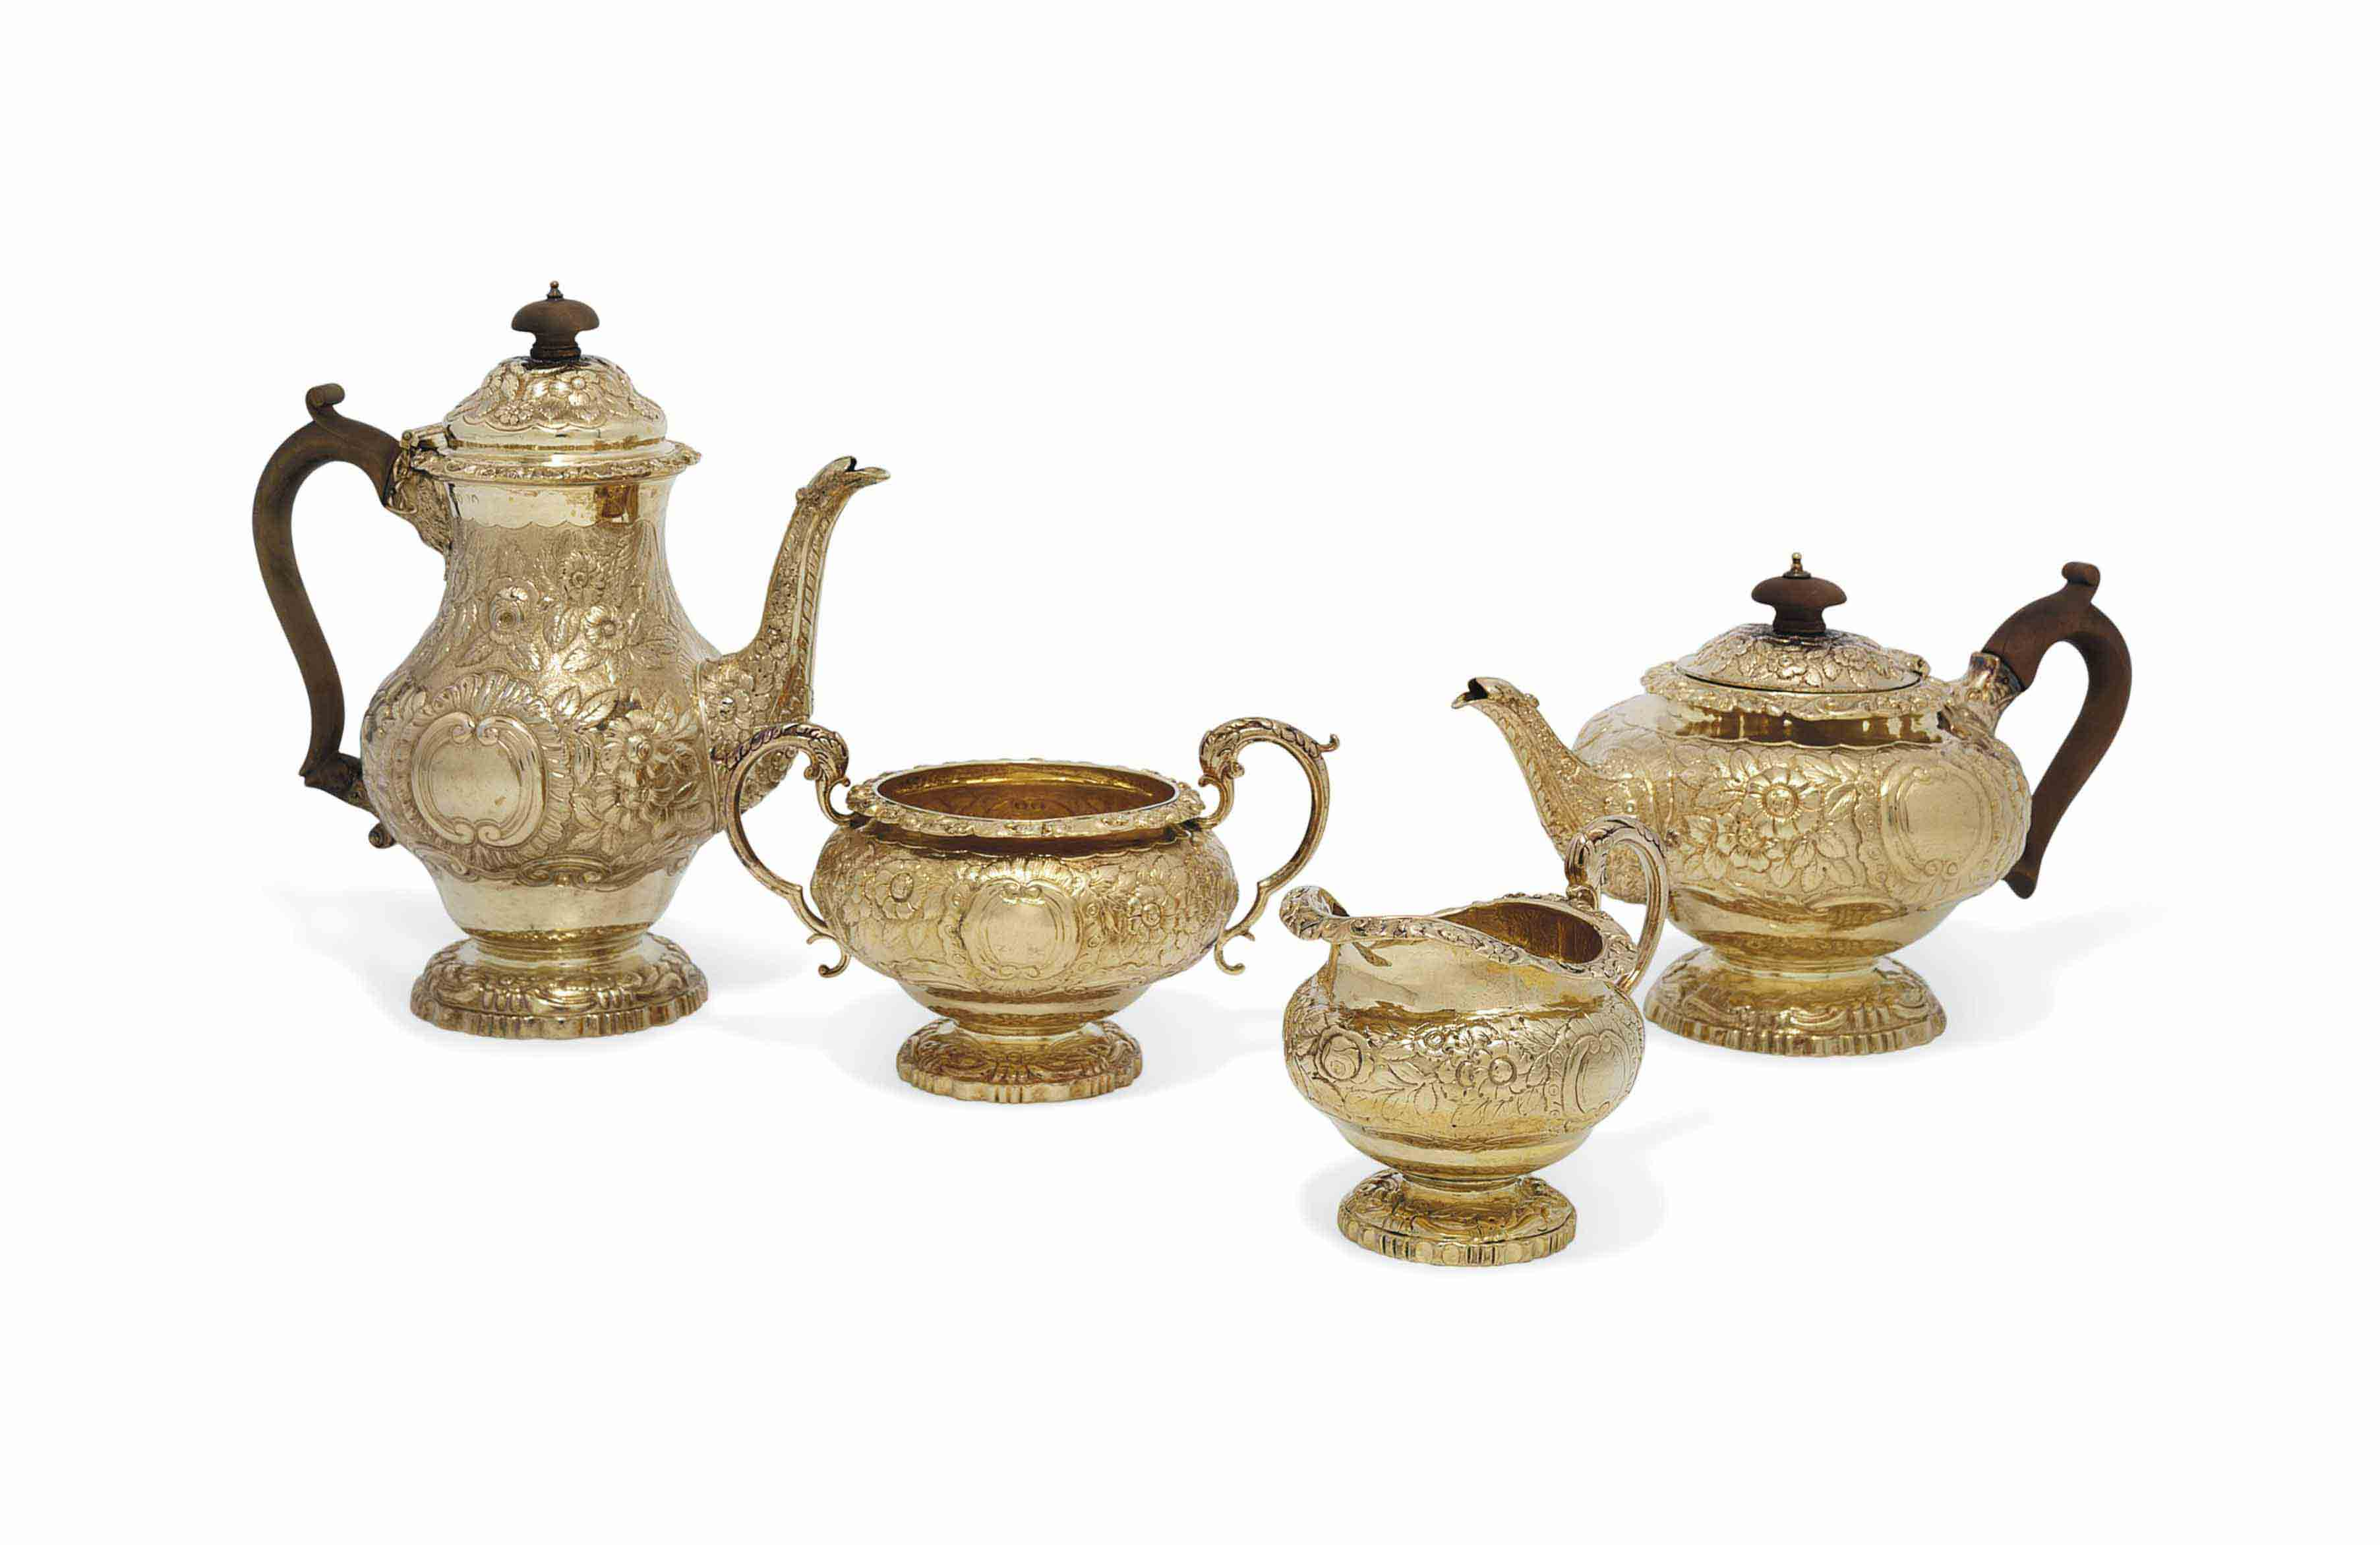 A FOUR-PIECE GEORGE III SILVER-GILT TEA AND COFFEE-SERVICE